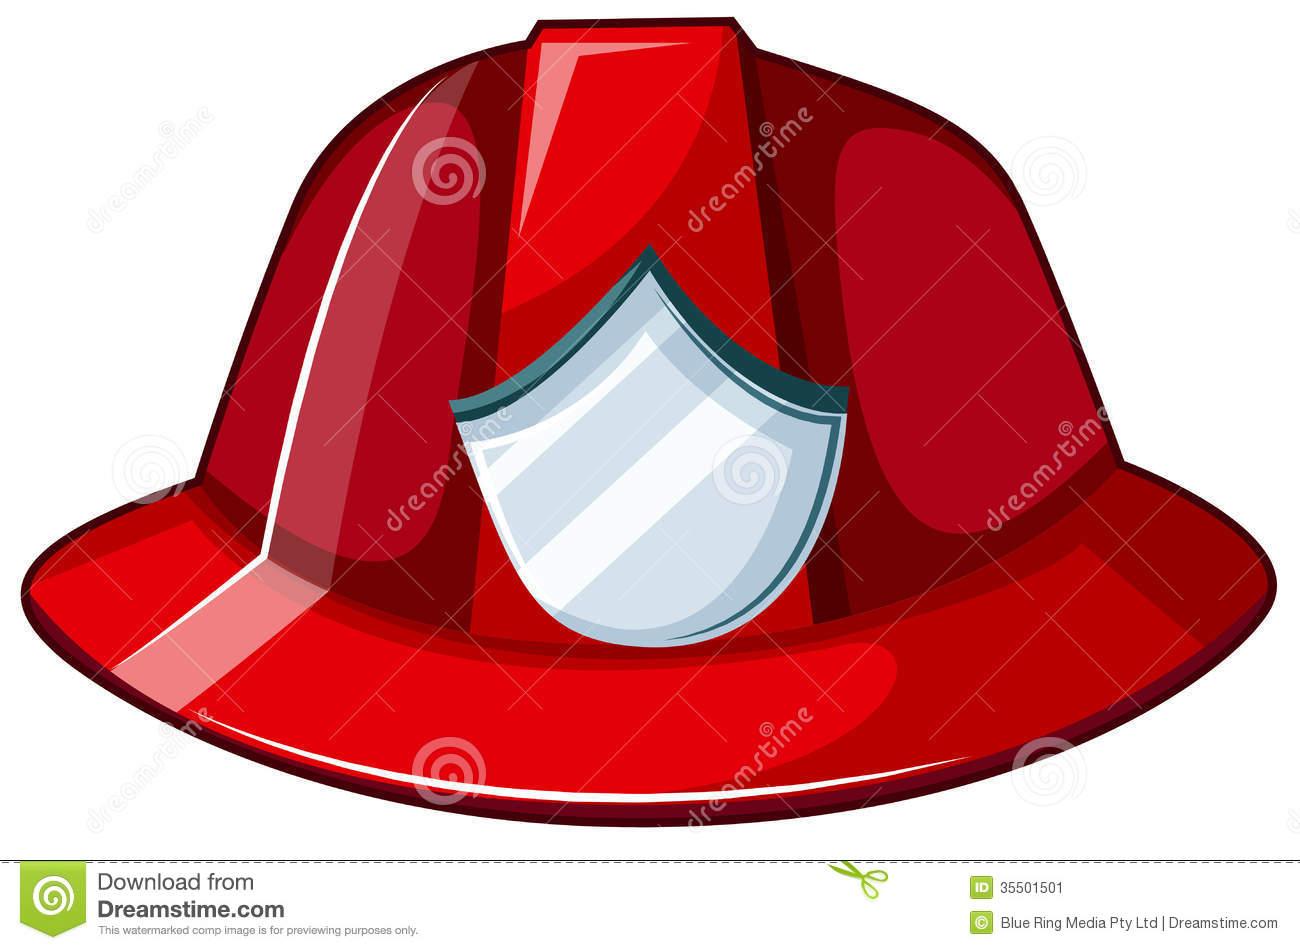 image transparent download Panda free images . Firefighter hat clipart